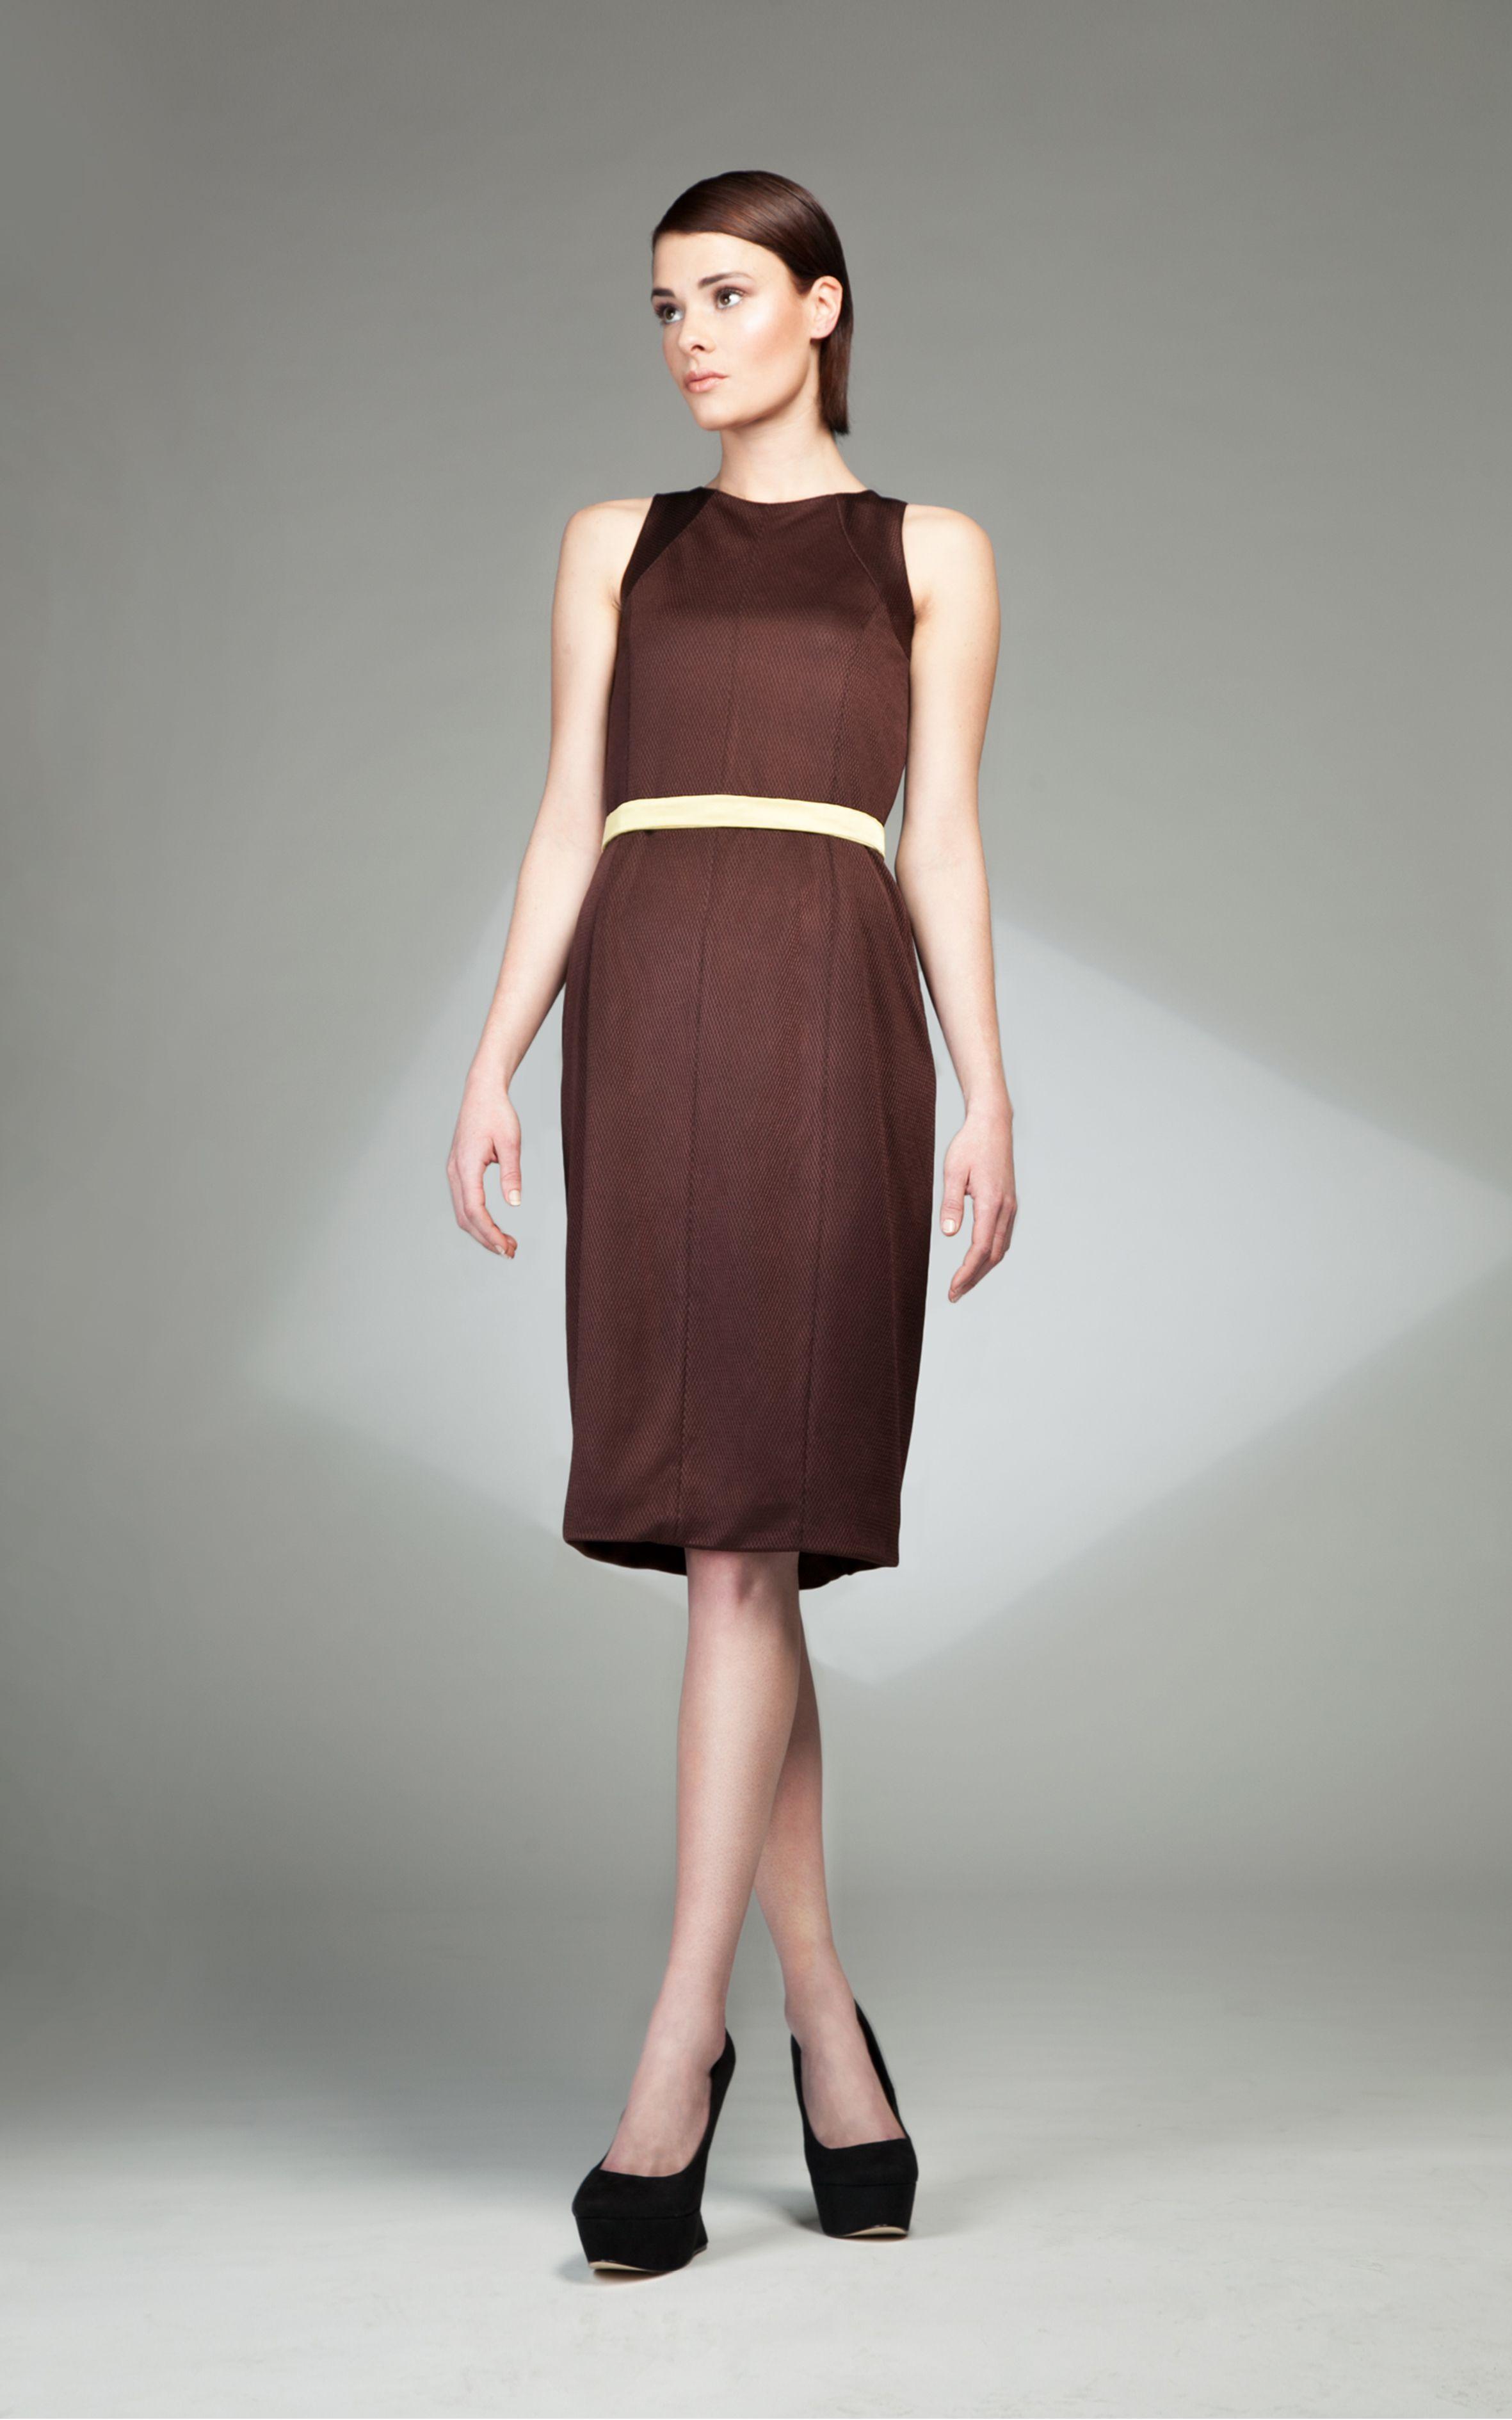 Www Codelevush Com Emerging Designers Fashion Fashion Fashion Design